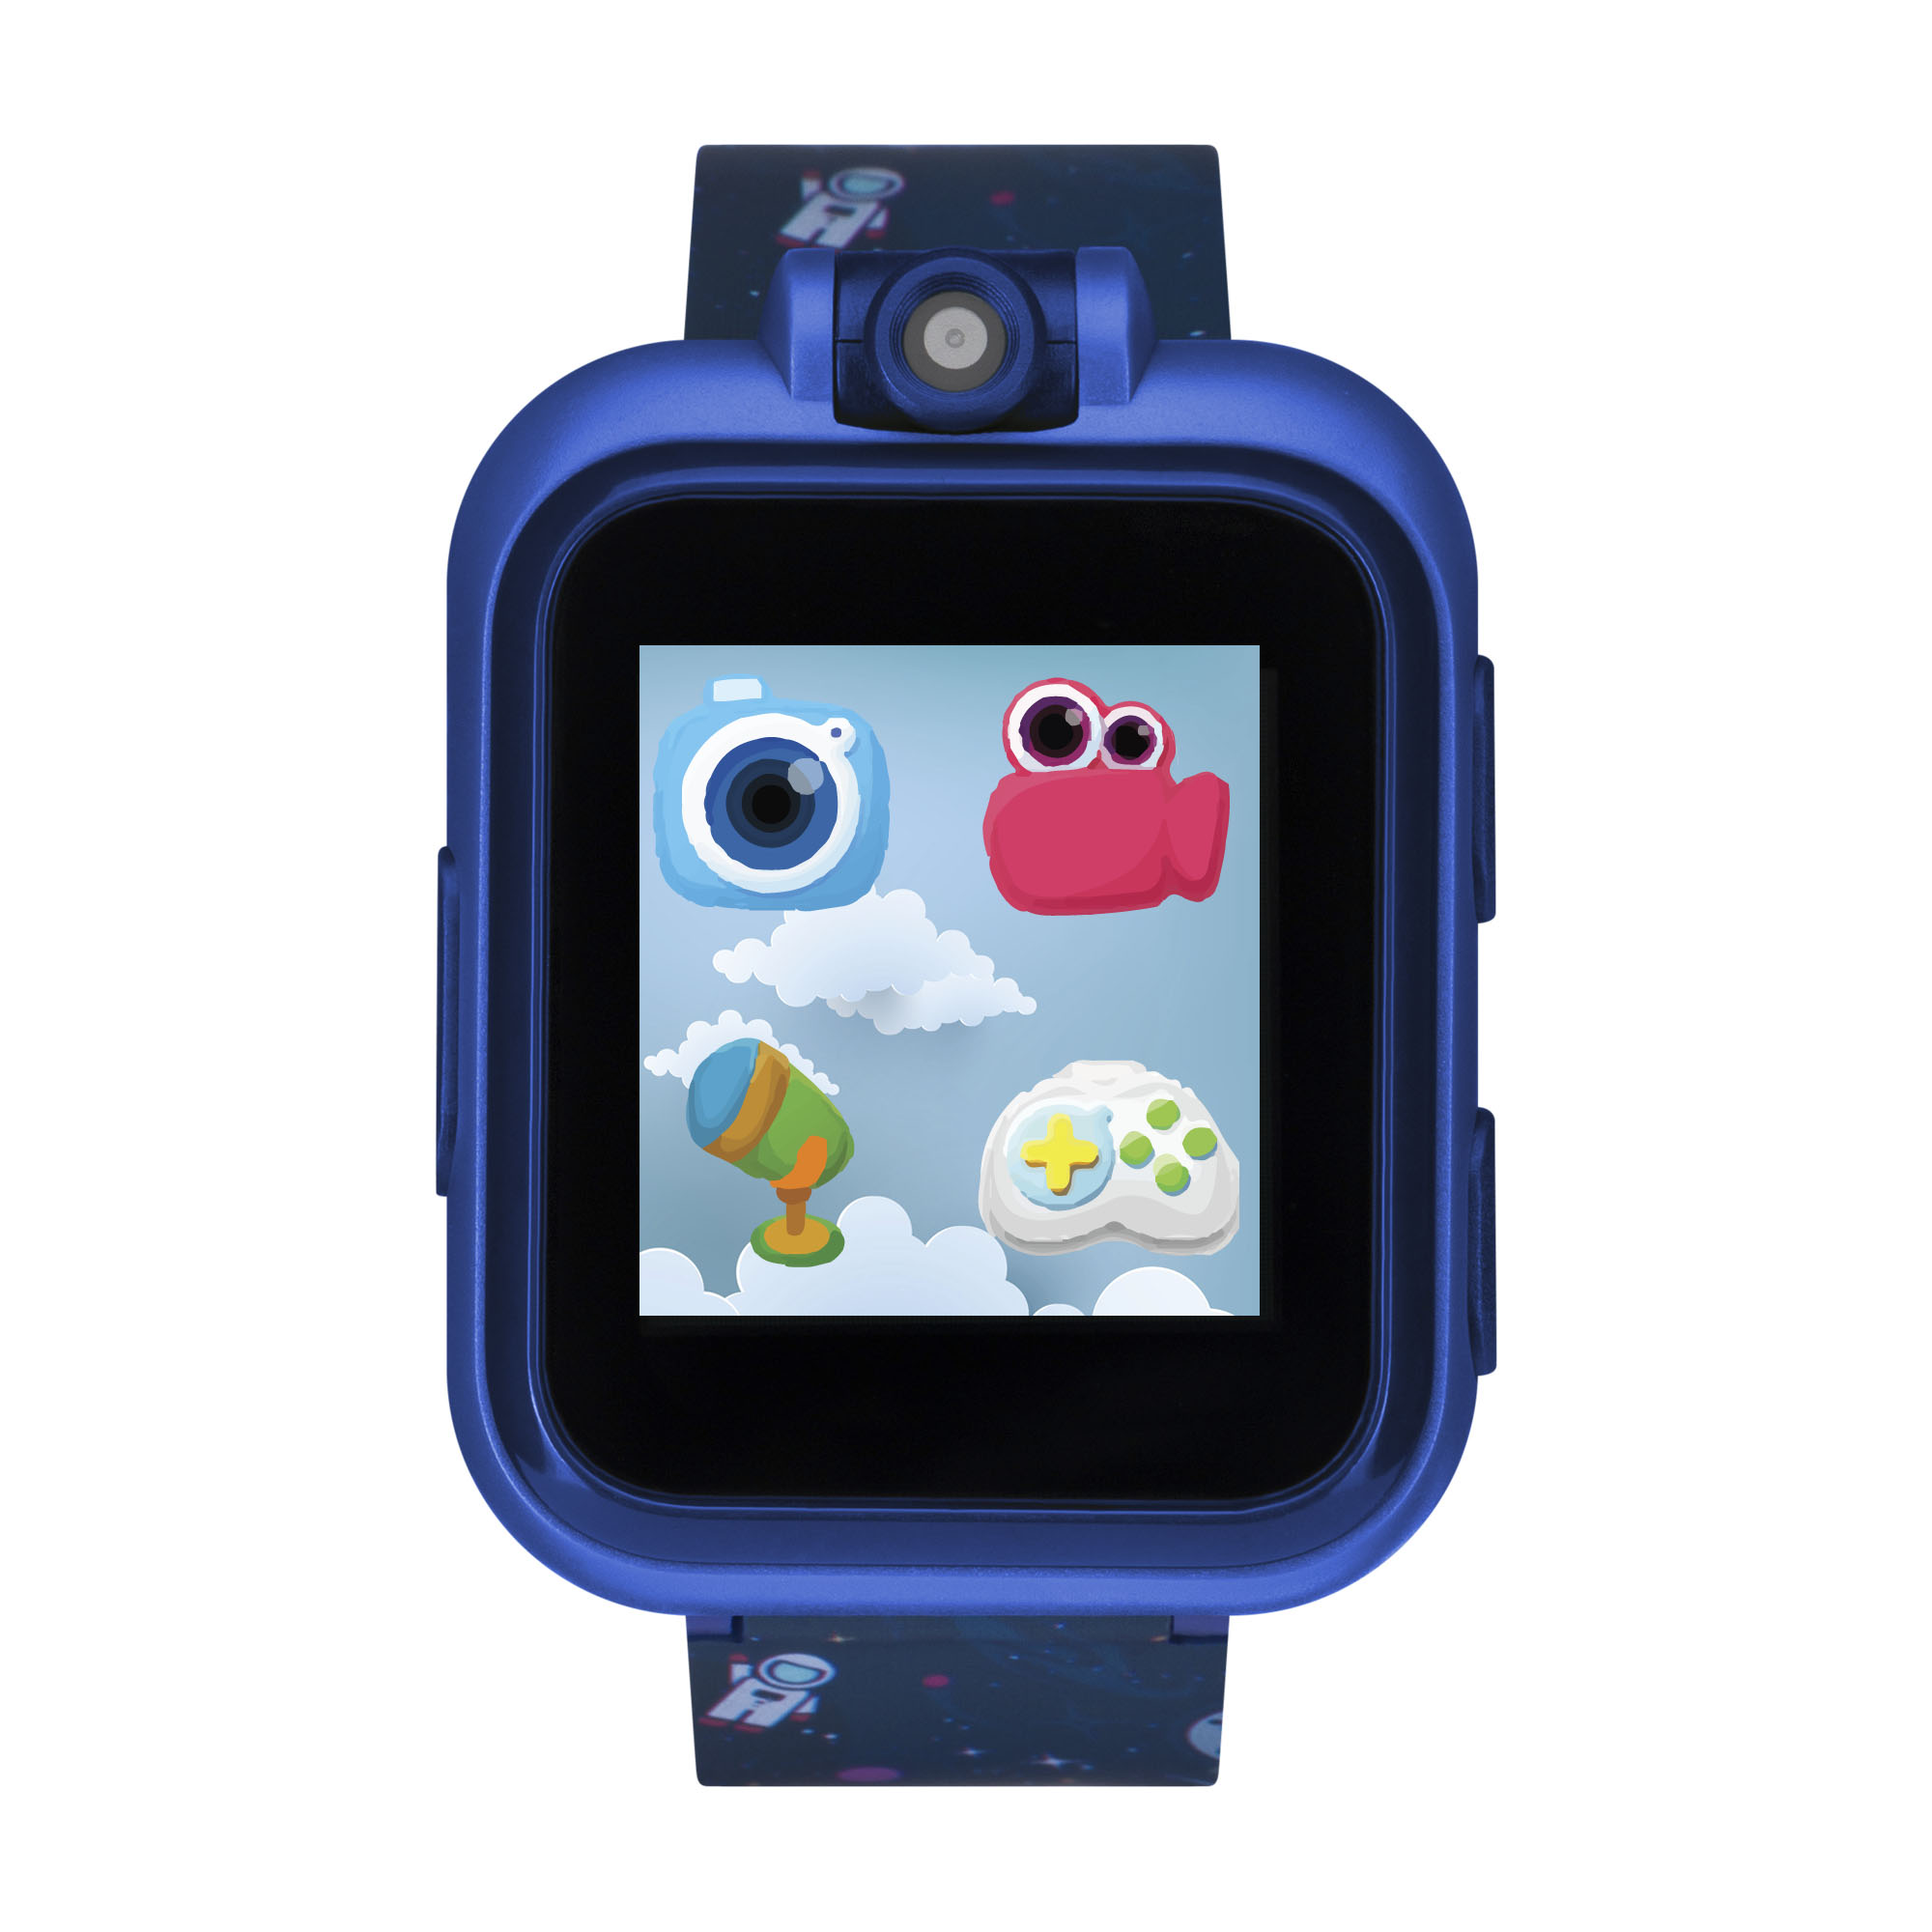 iTech Jr. Kids Smartwatch for Boys - Space